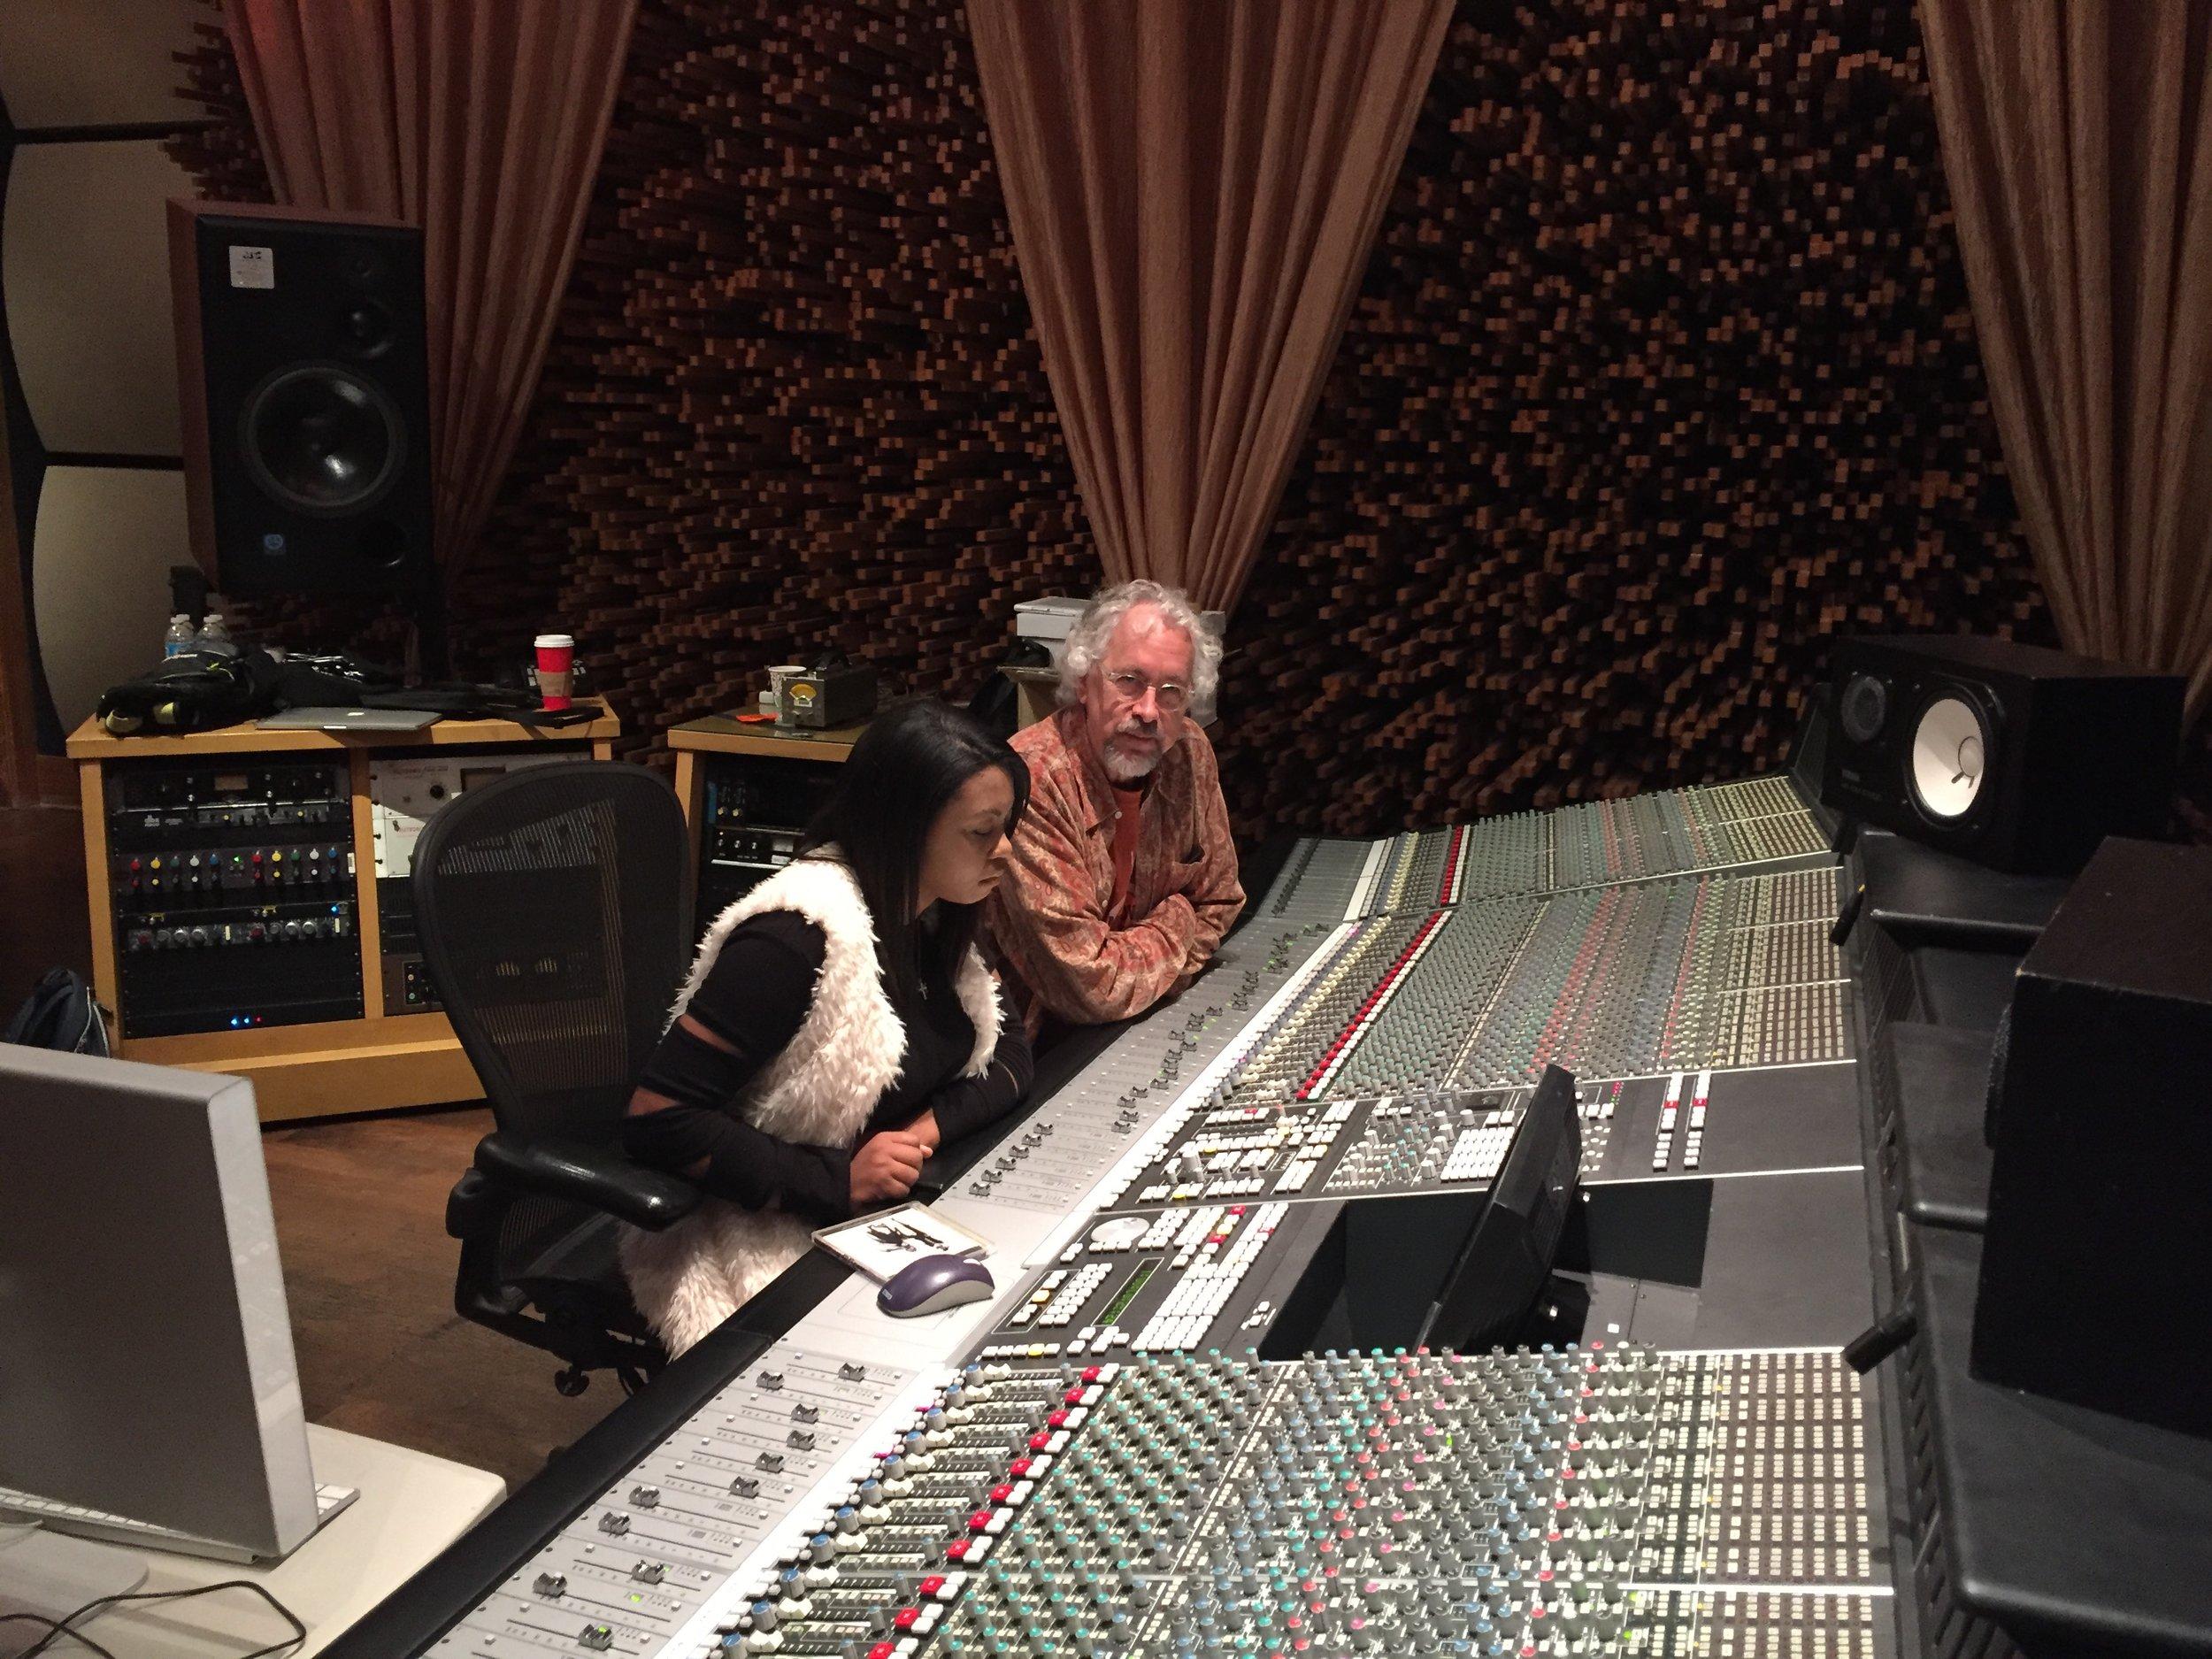 Sarina-Joi Crowe and Rick Clark - Disco Slam sessions, Blackbird Studios